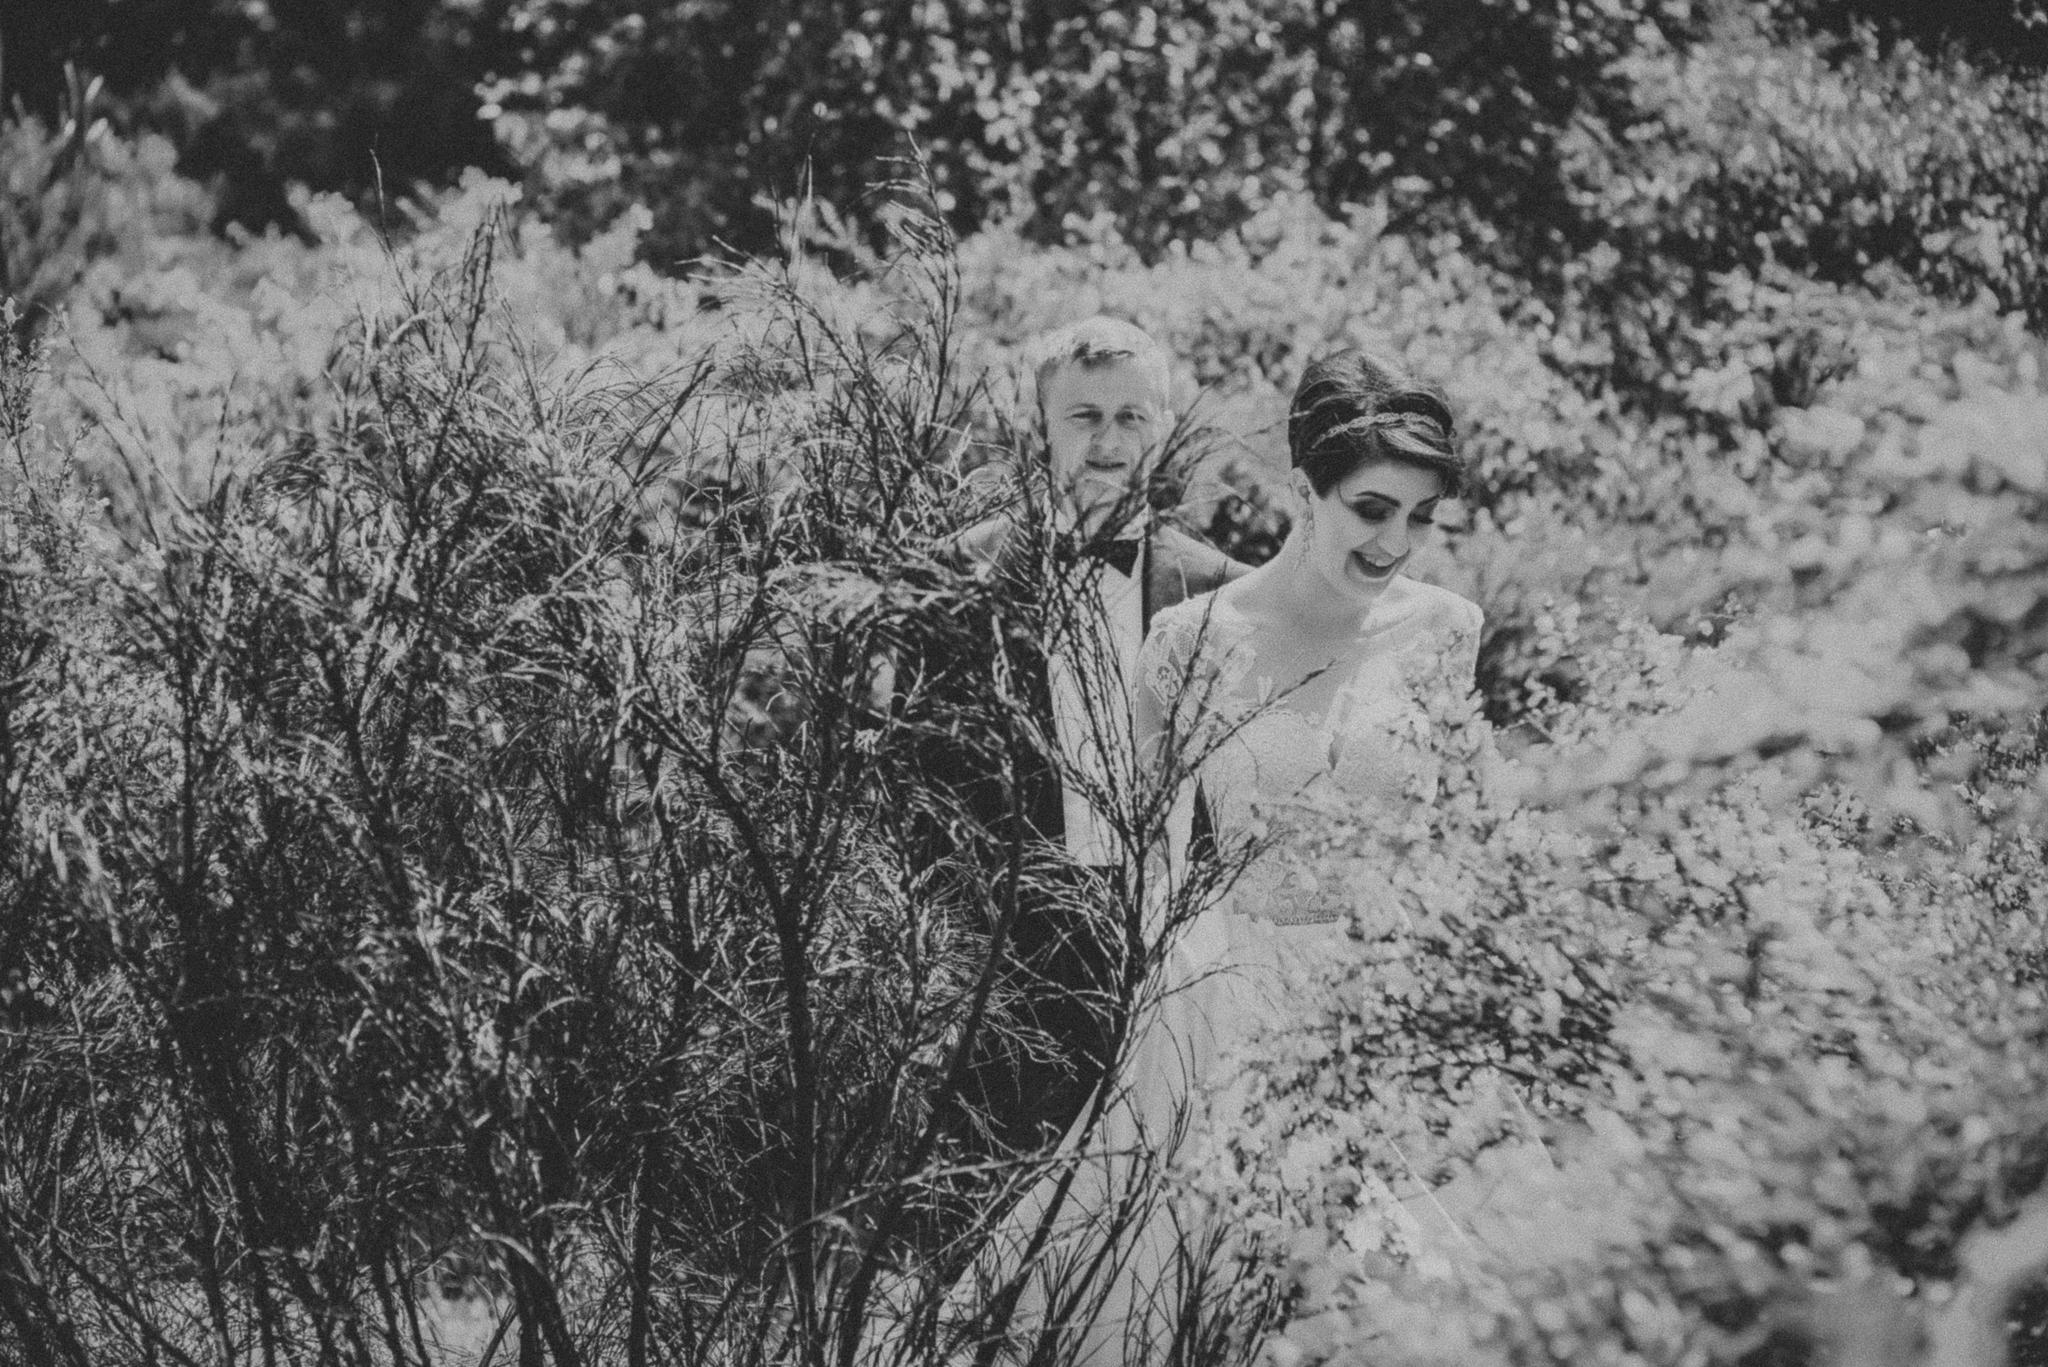 0503_Daria&Szymon__slub_grabow_nad_prosna_wesele_dworek_w_grabowie__fotografia_slubna_________www_amfoto_pl_DSC_6970.jpg